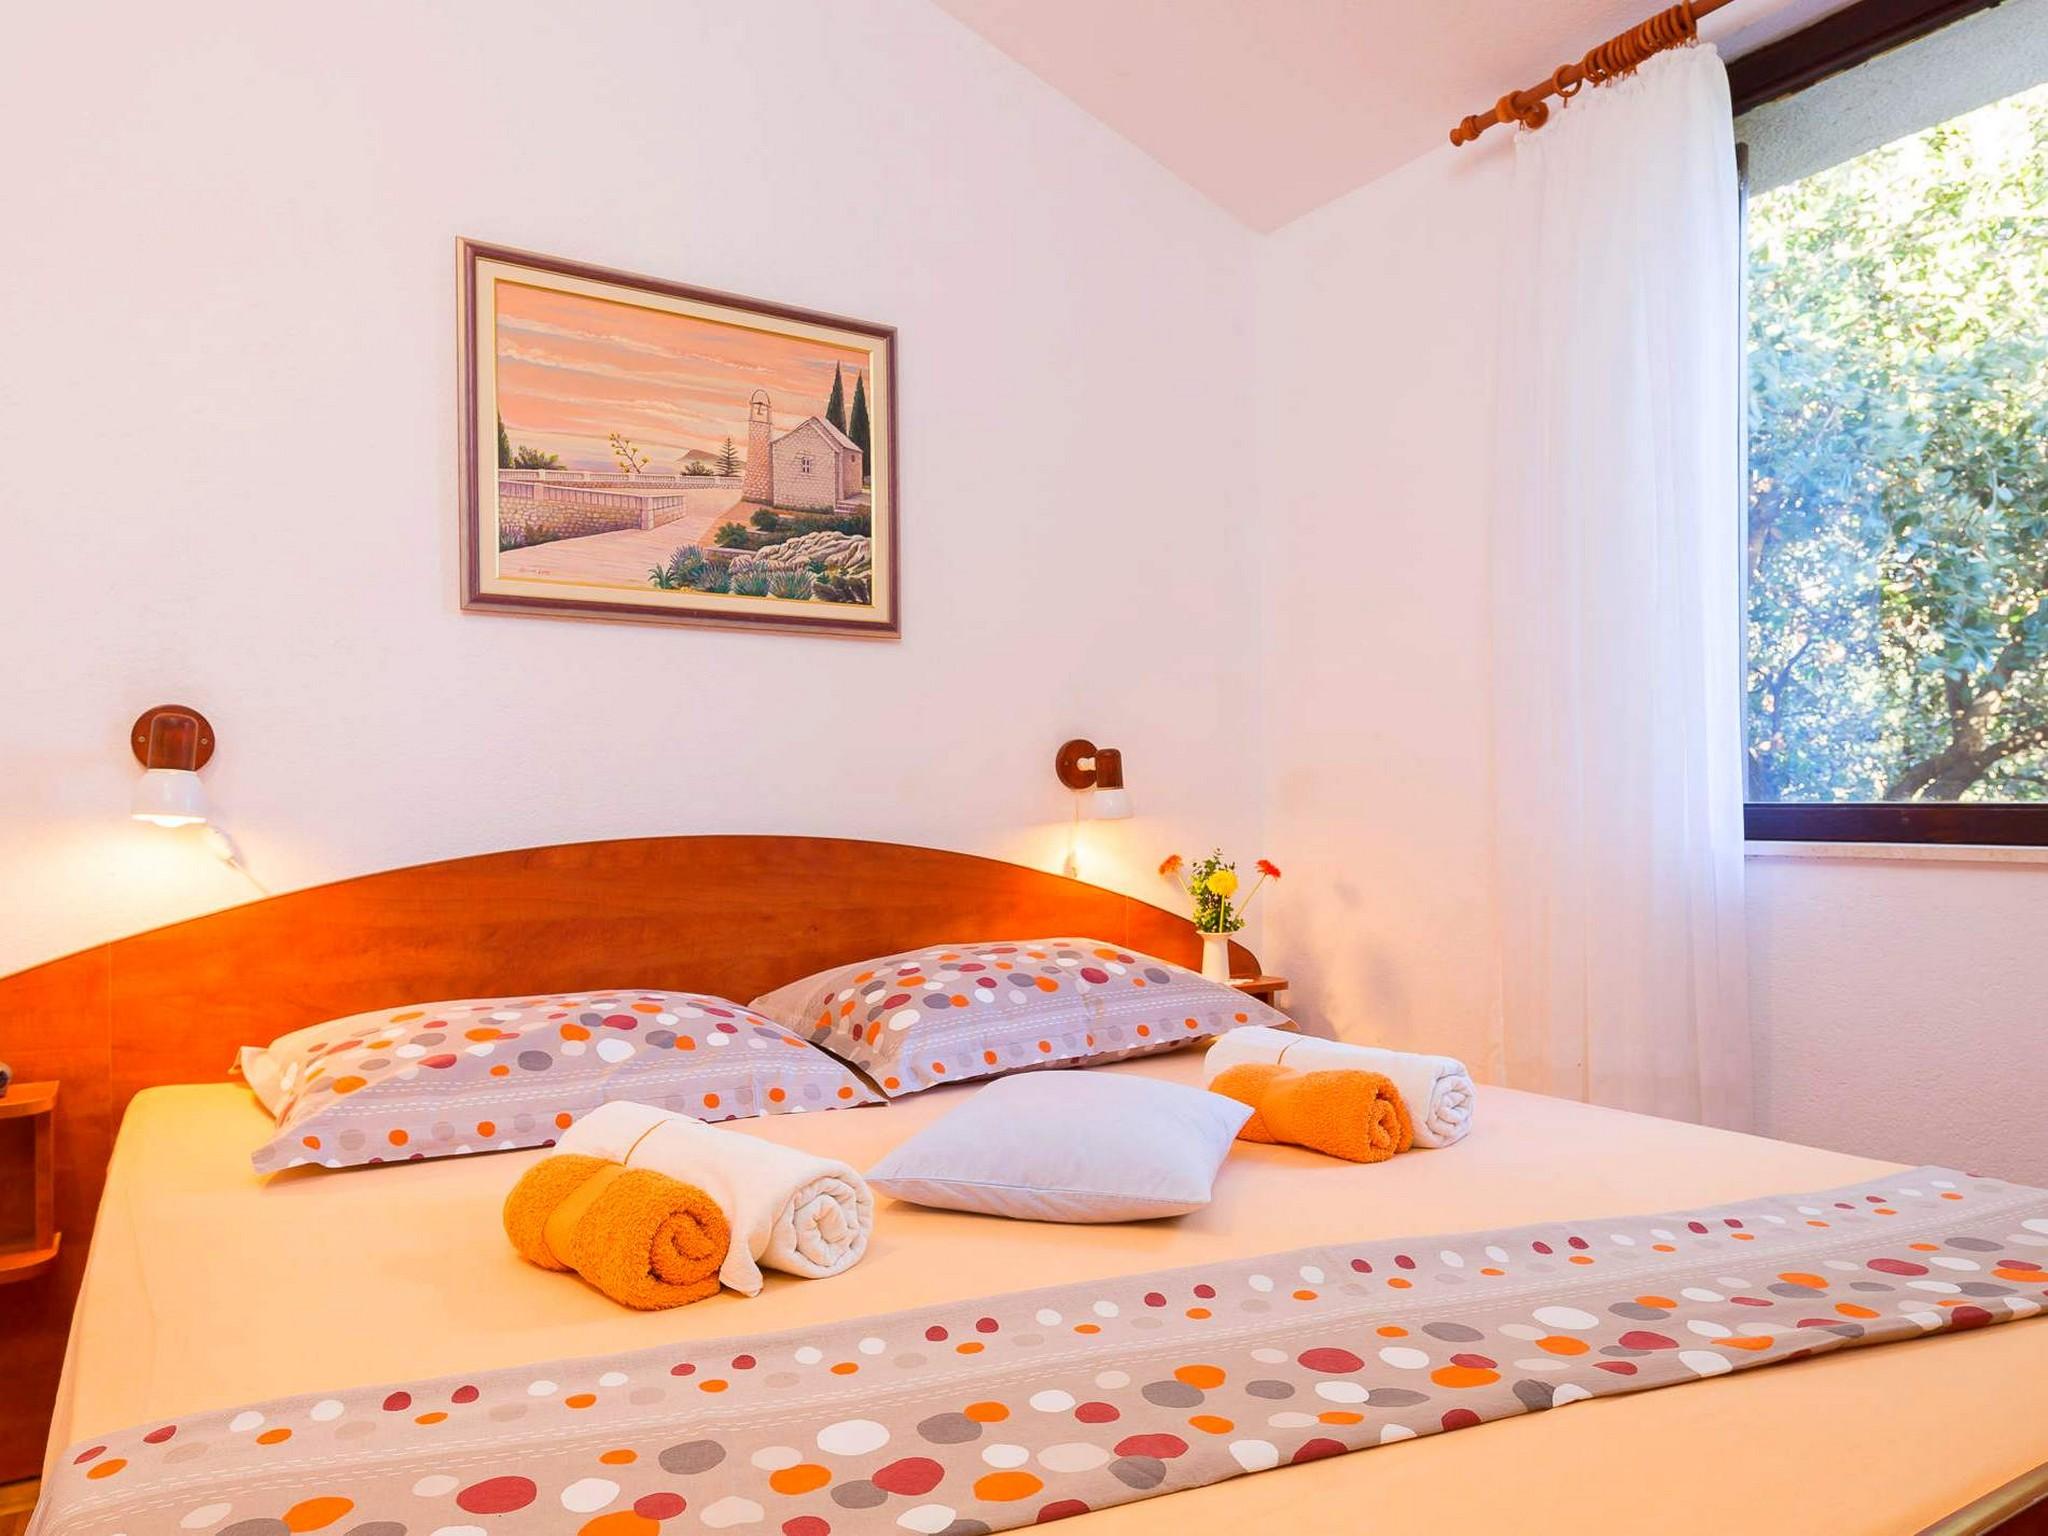 Ferienhaus Tanja, Kua K6+2 (940510), Kanica, , Dalmatien, Kroatien, Bild 30